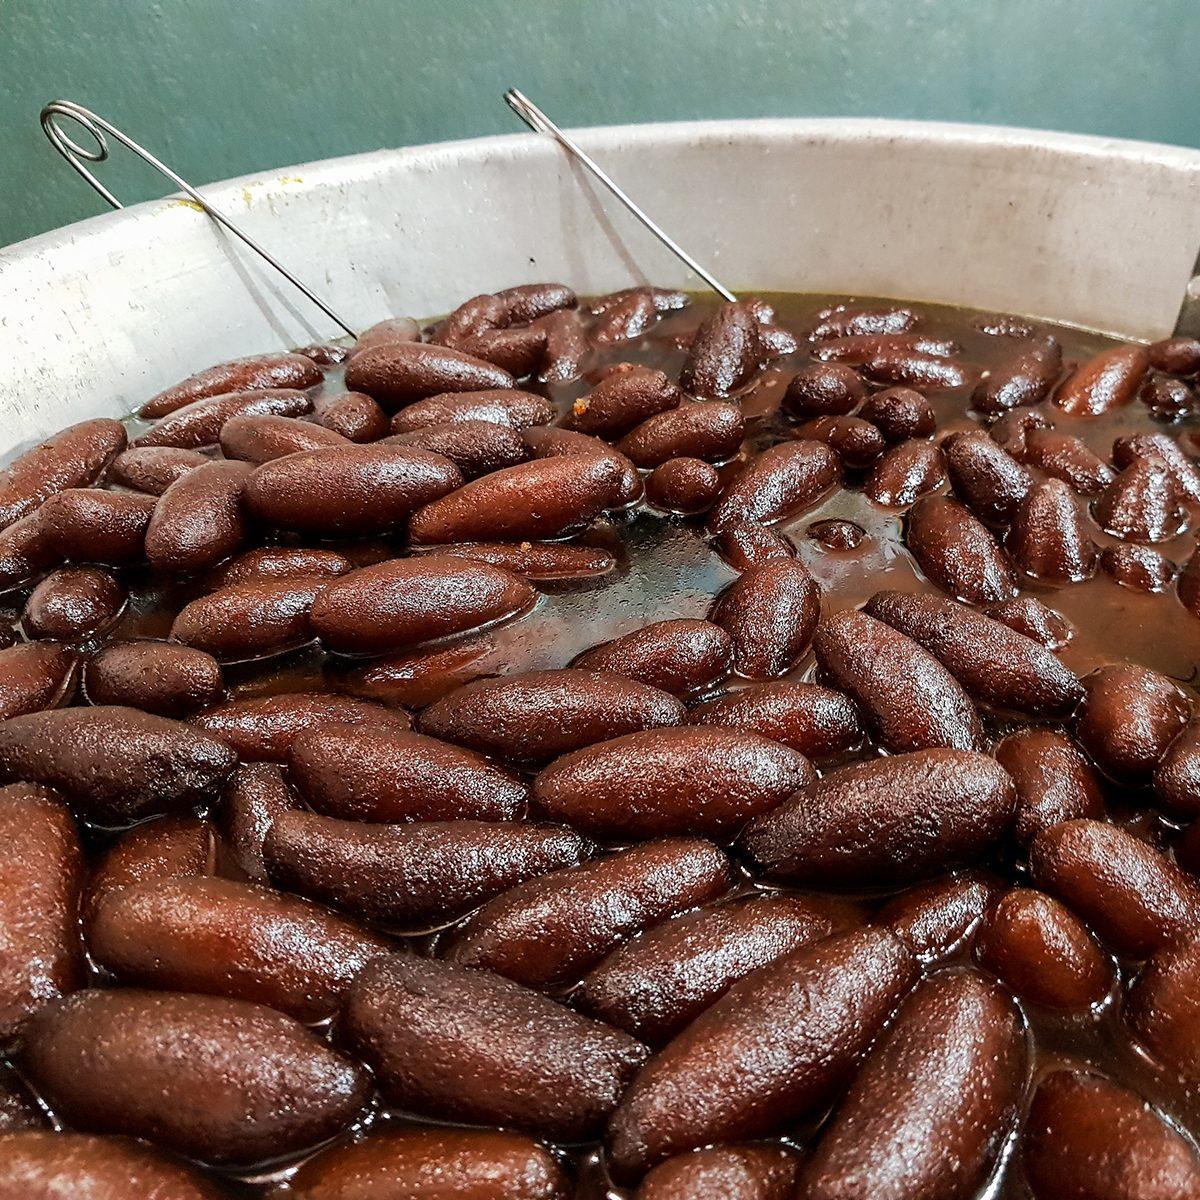 fried long sweet lyancha of shaktigarh dipped in sugar syrup. lengcha